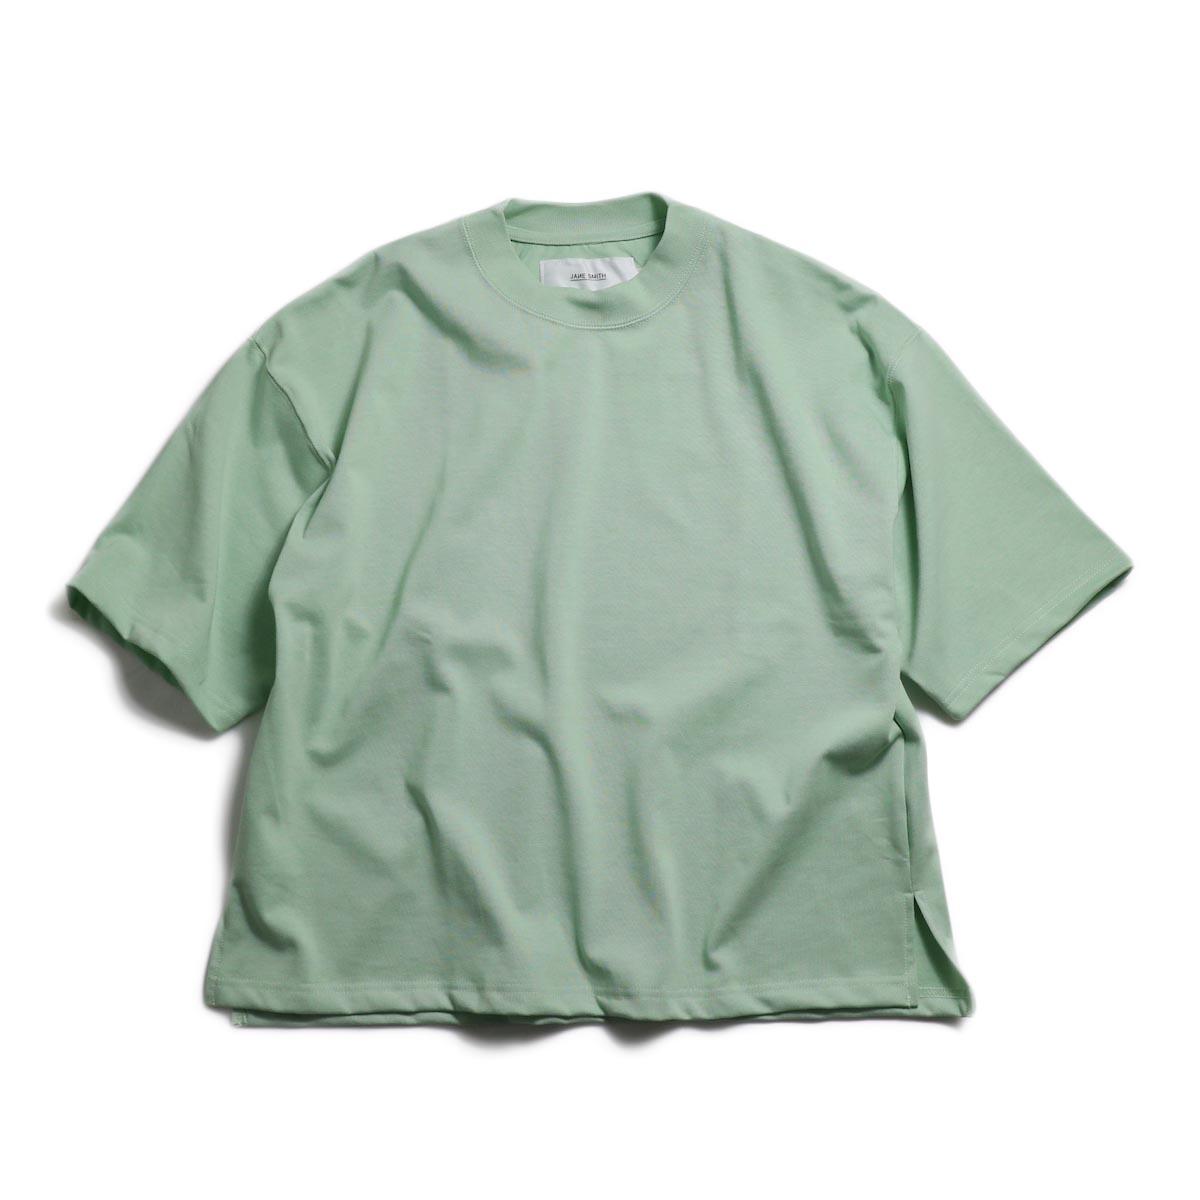 JANE SMITH / Big T Shirt -Mint